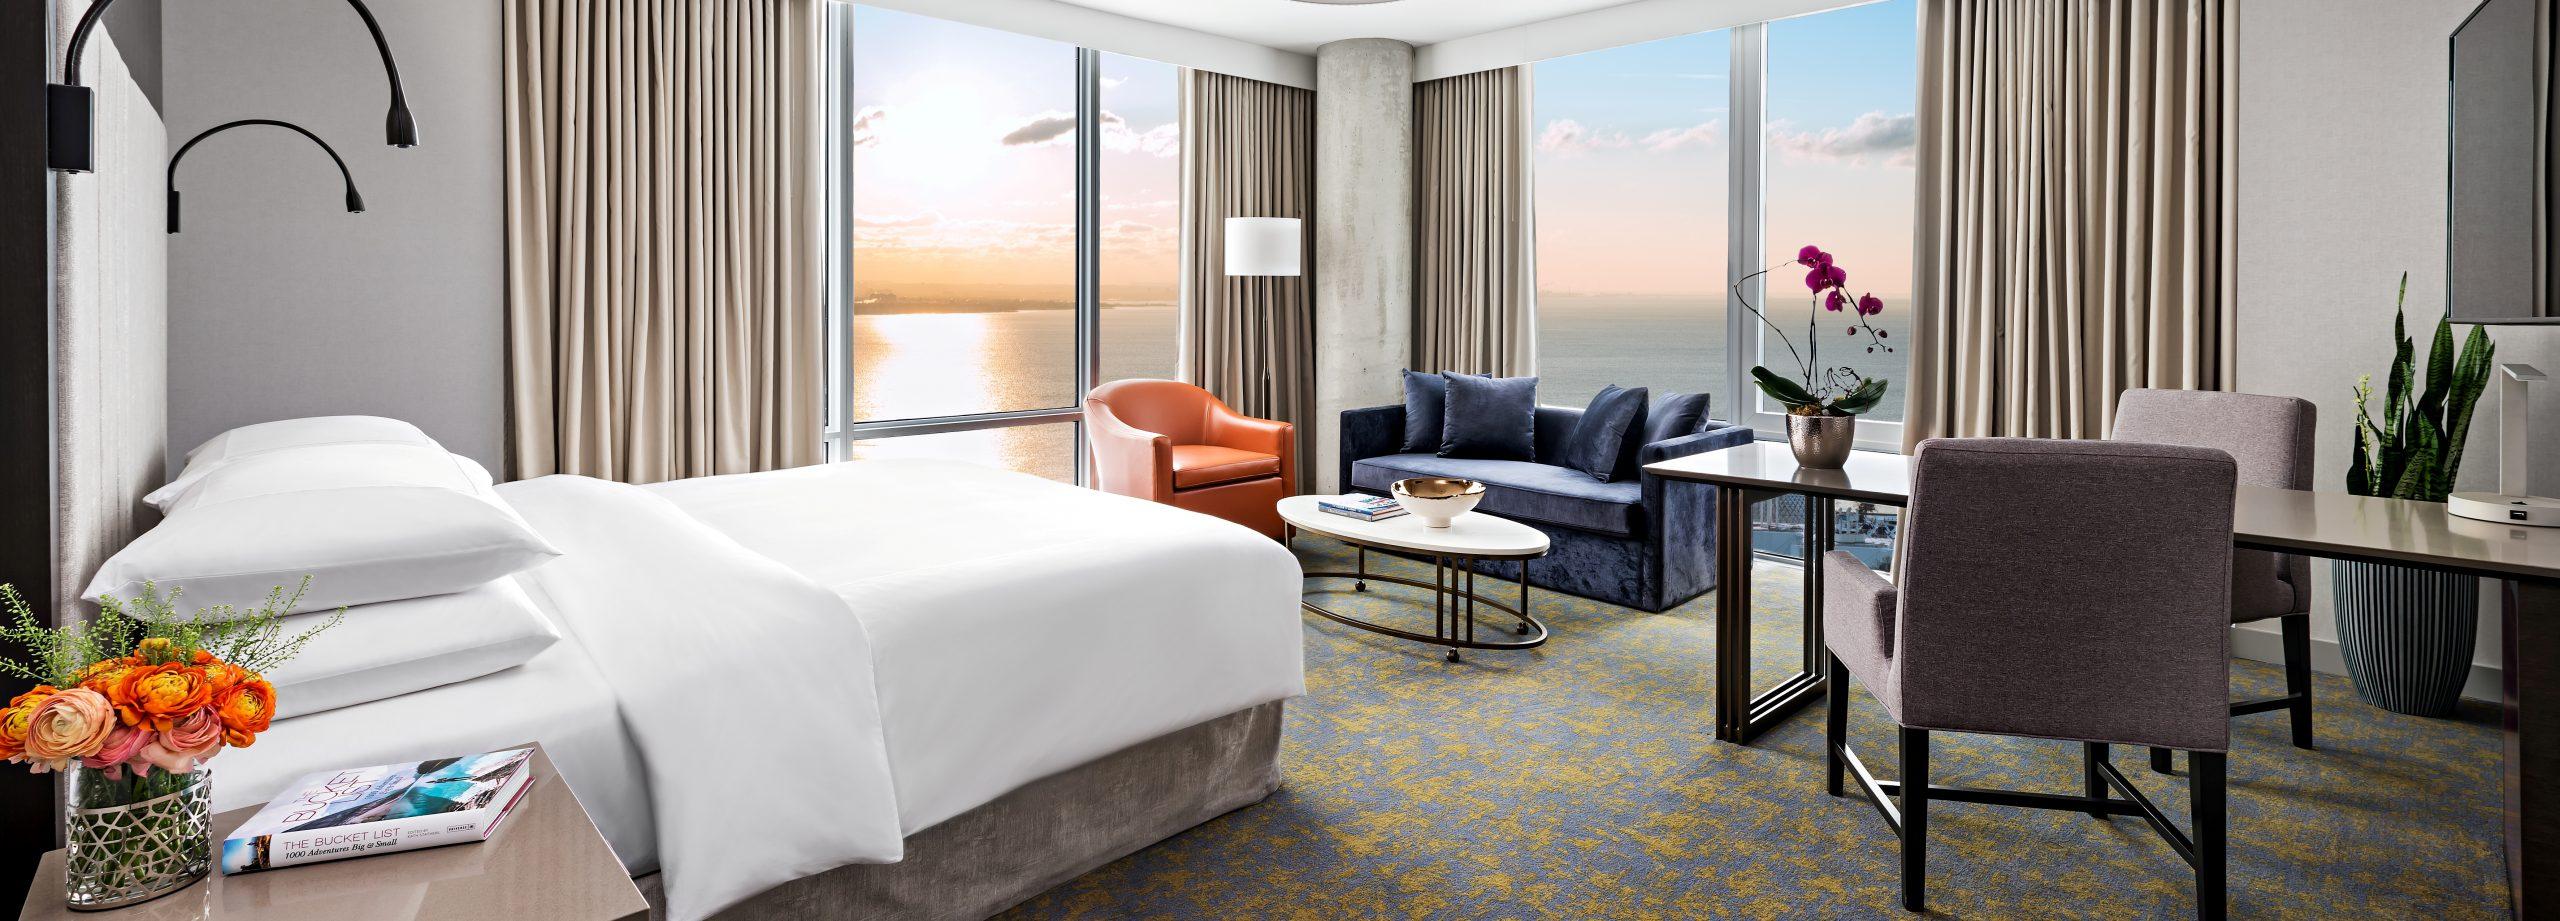 hotel x toronto suite